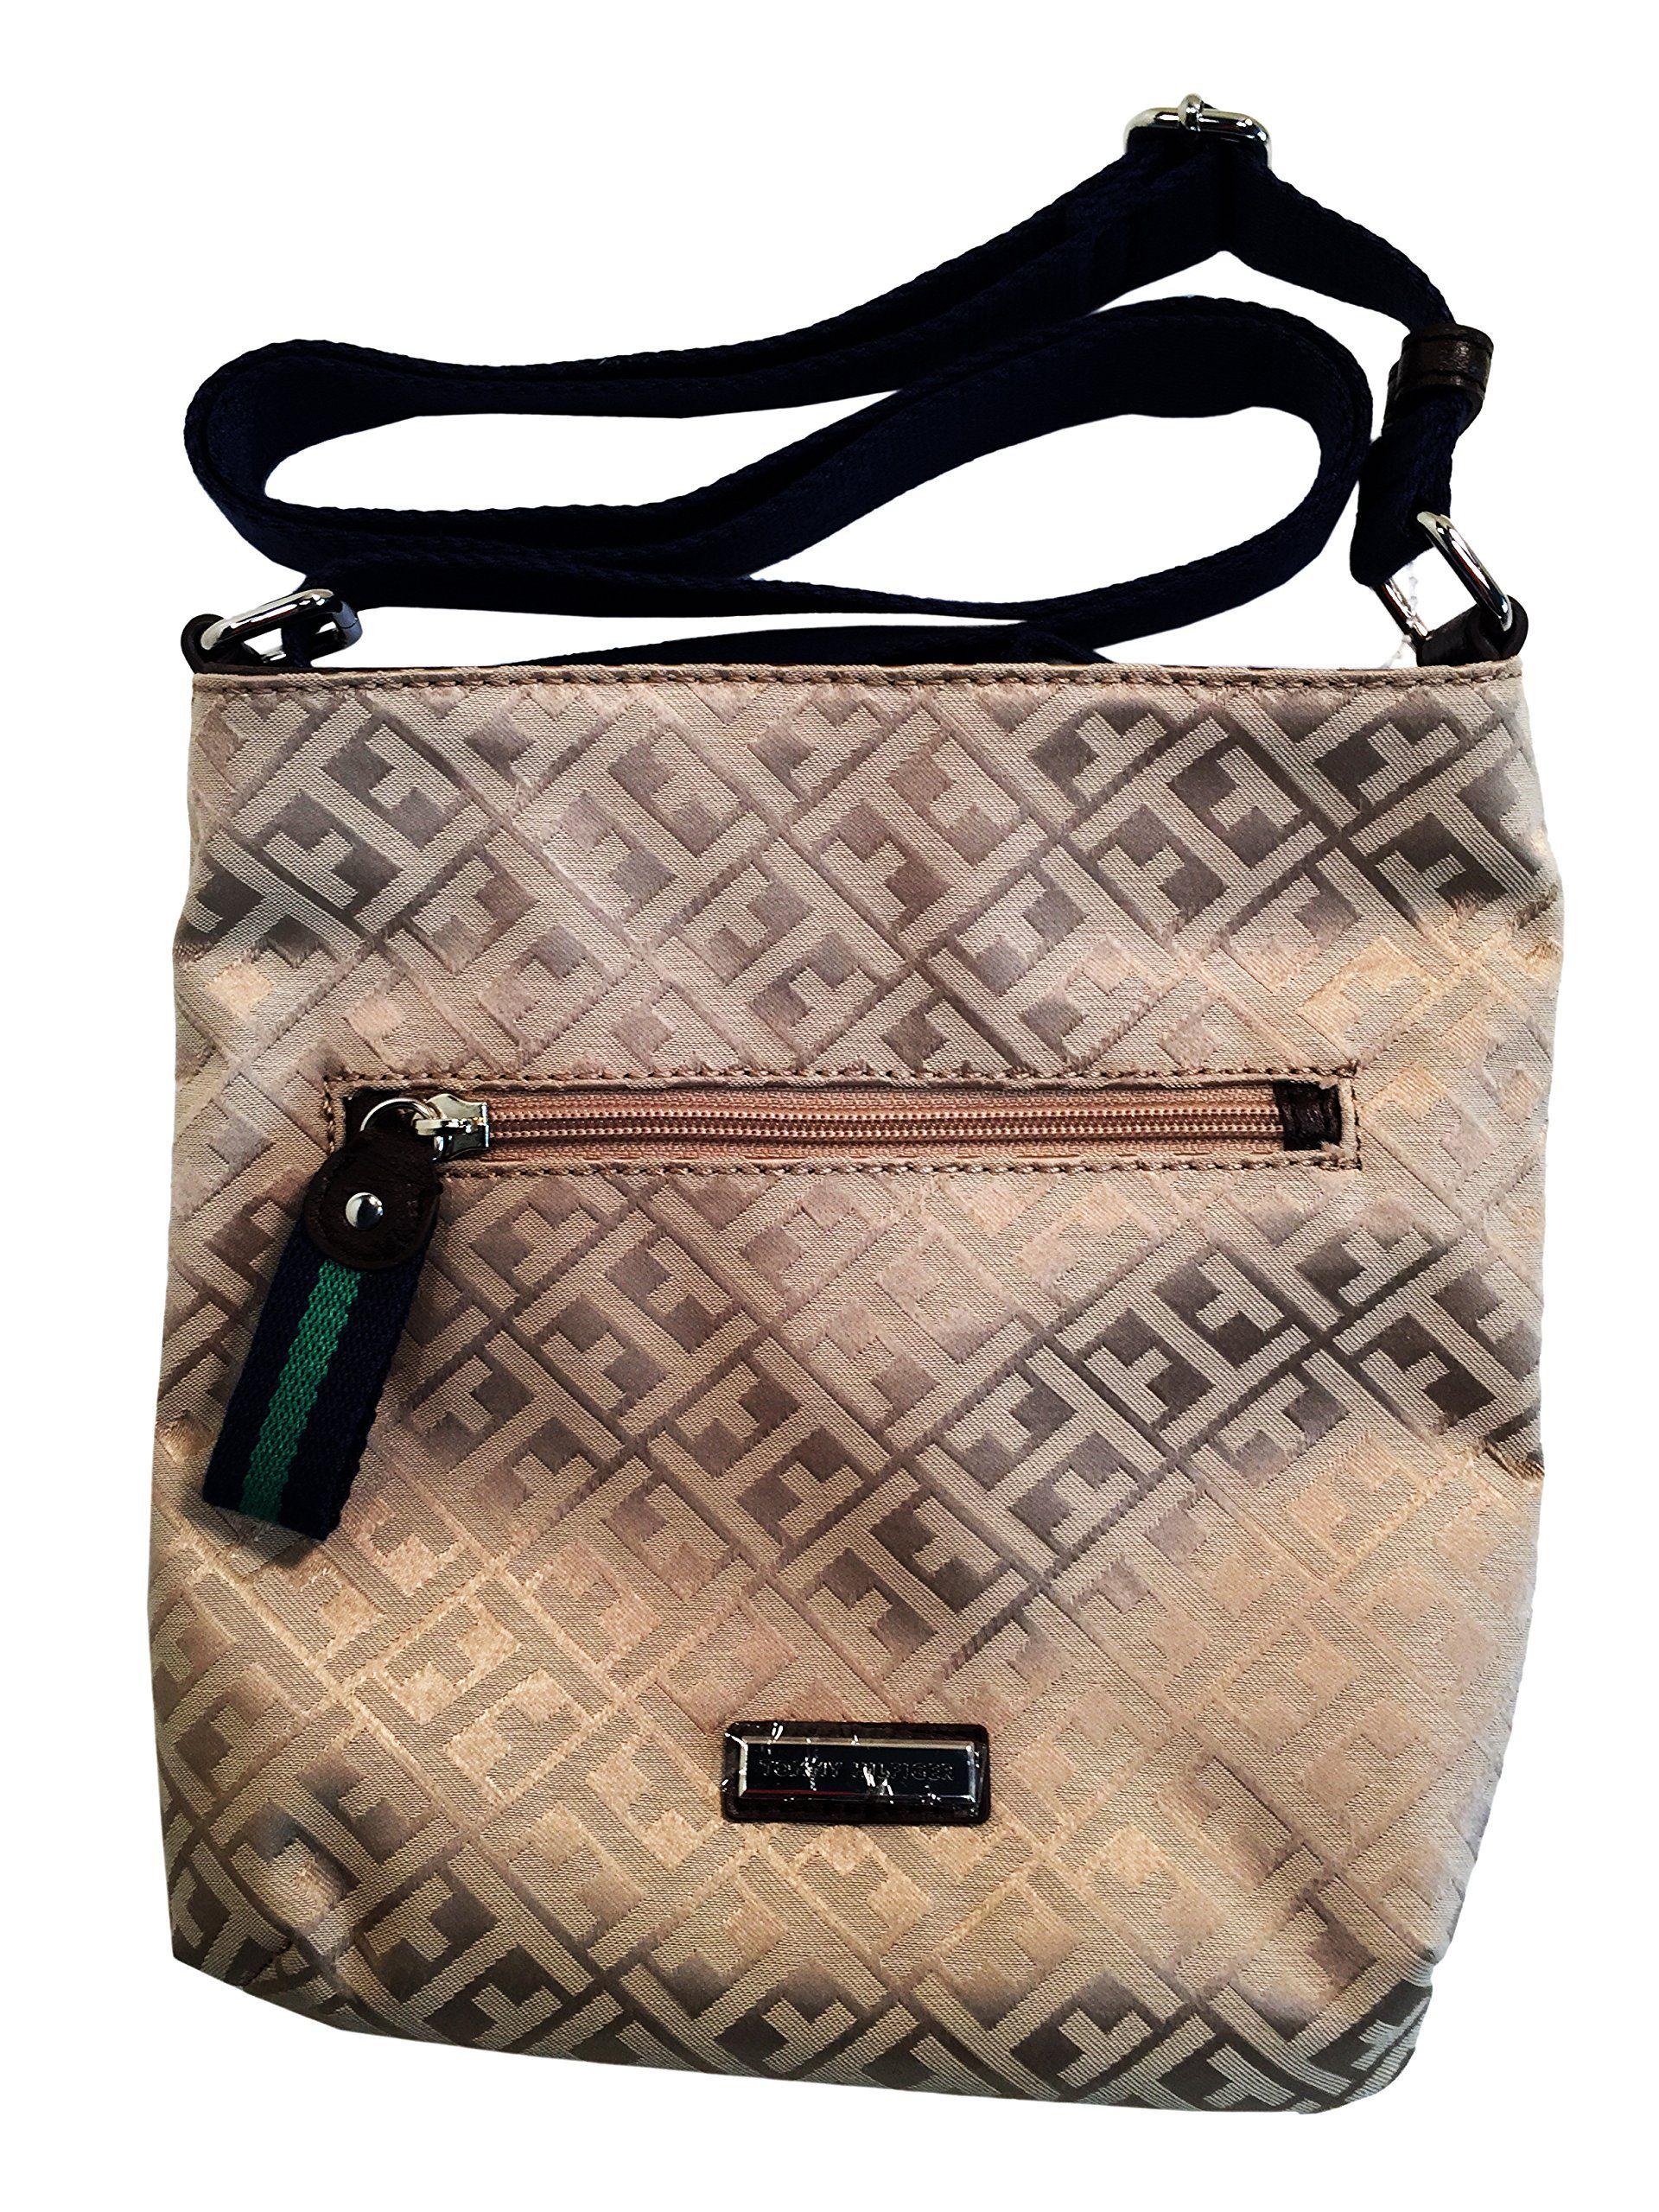 "Tommy Hilfiger Small Crossbody Handbag Purse (Beige/Beige Big H). Stylish design, very fashionable. Durable material. Zip Top Closure. Exterior Zip Pocket. Adjustable Crossbody Strap. Measures: 9"" x 9"" x 1.5""."